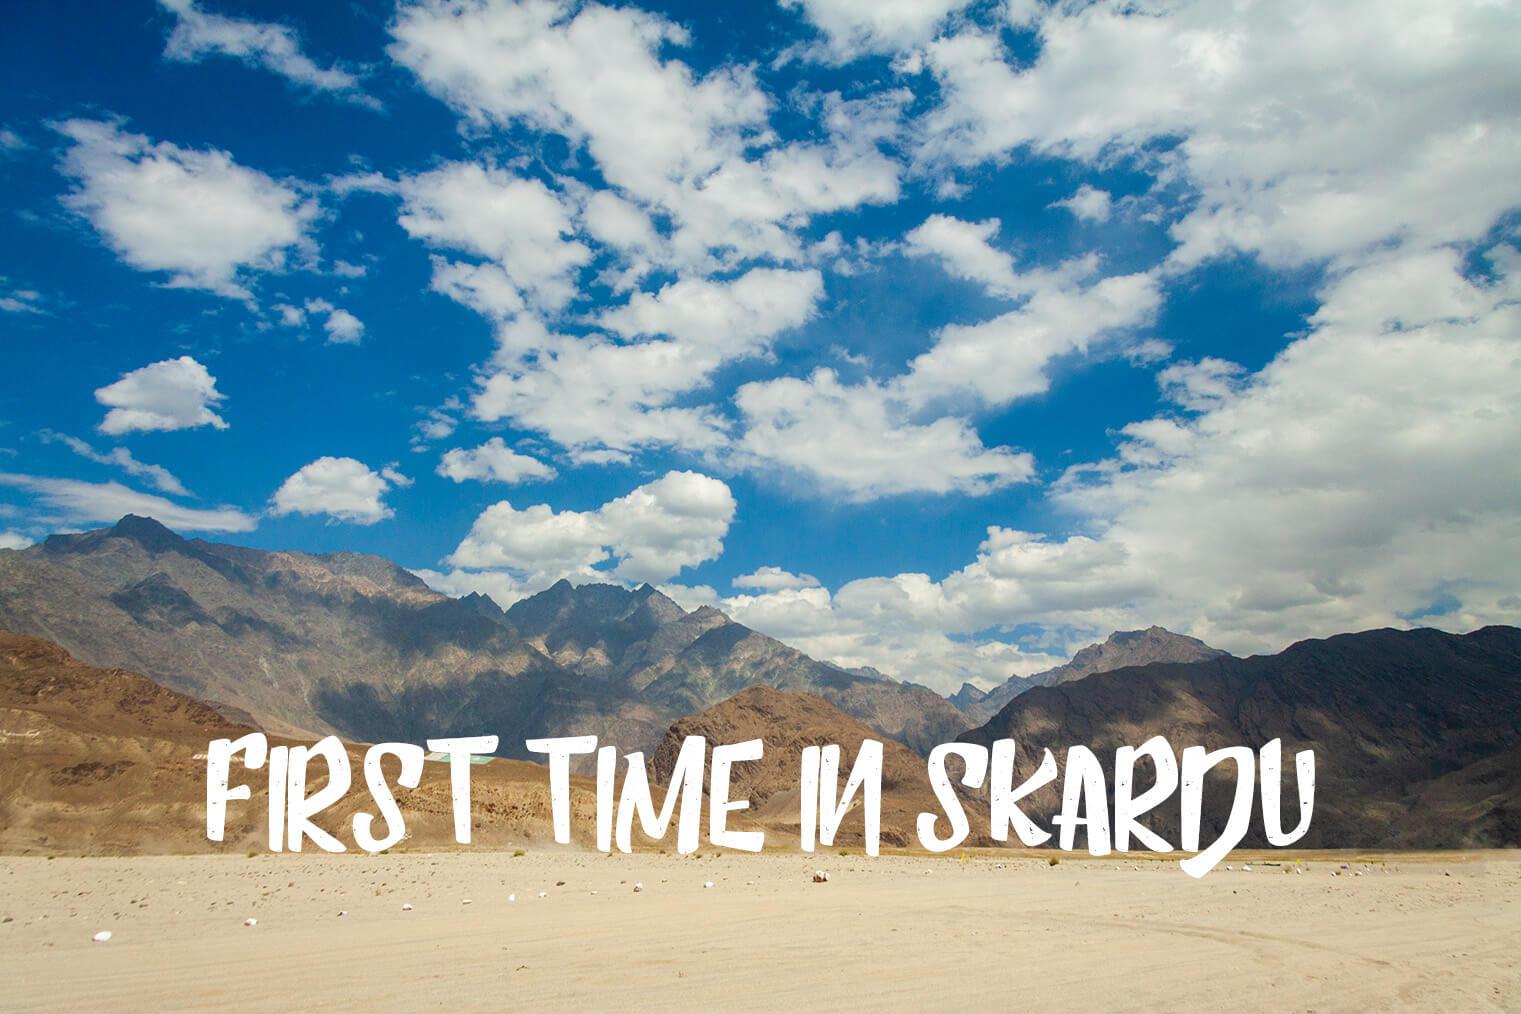 First time in Skardu